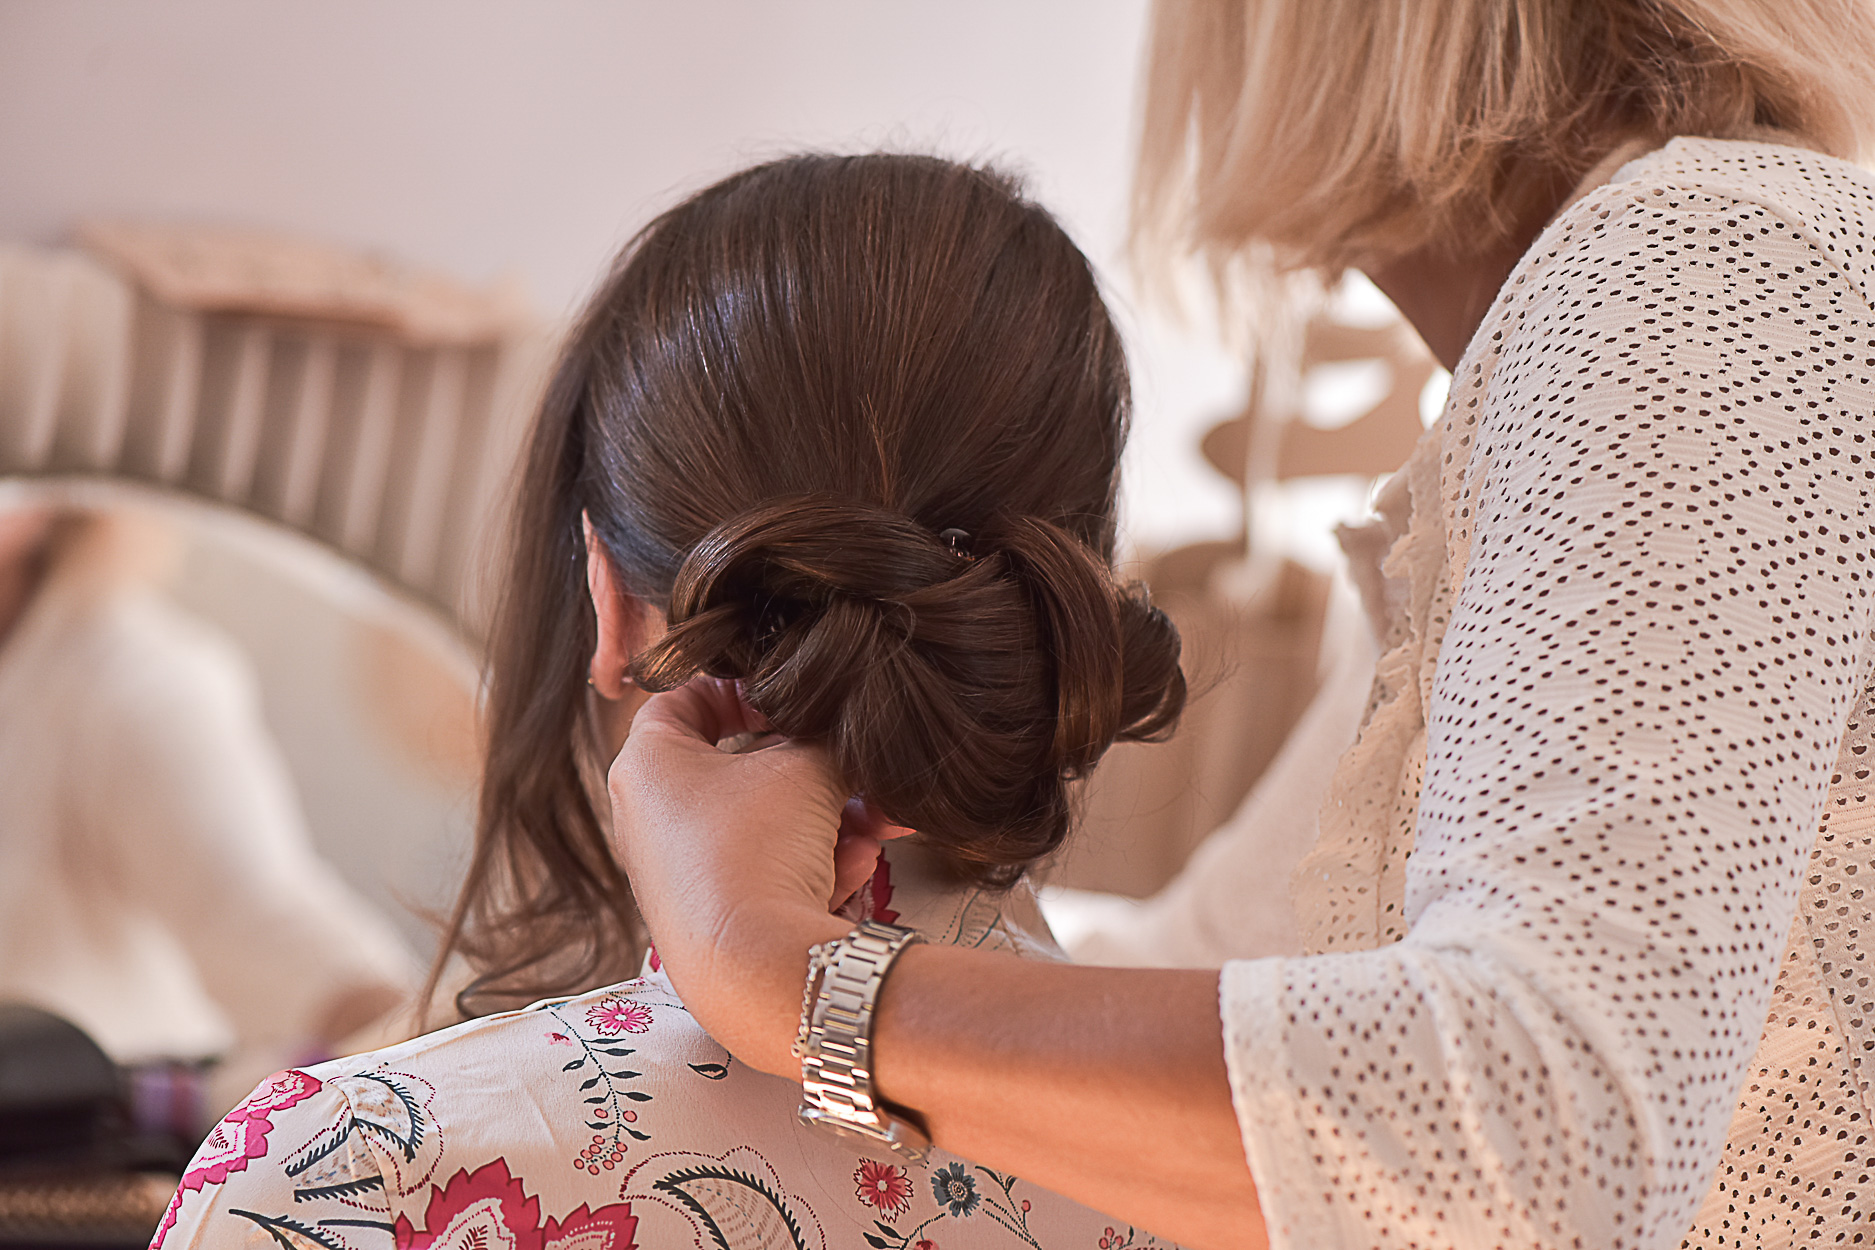 photographe-mariage-ferme-armenon-coiffure-preparatif-mariee